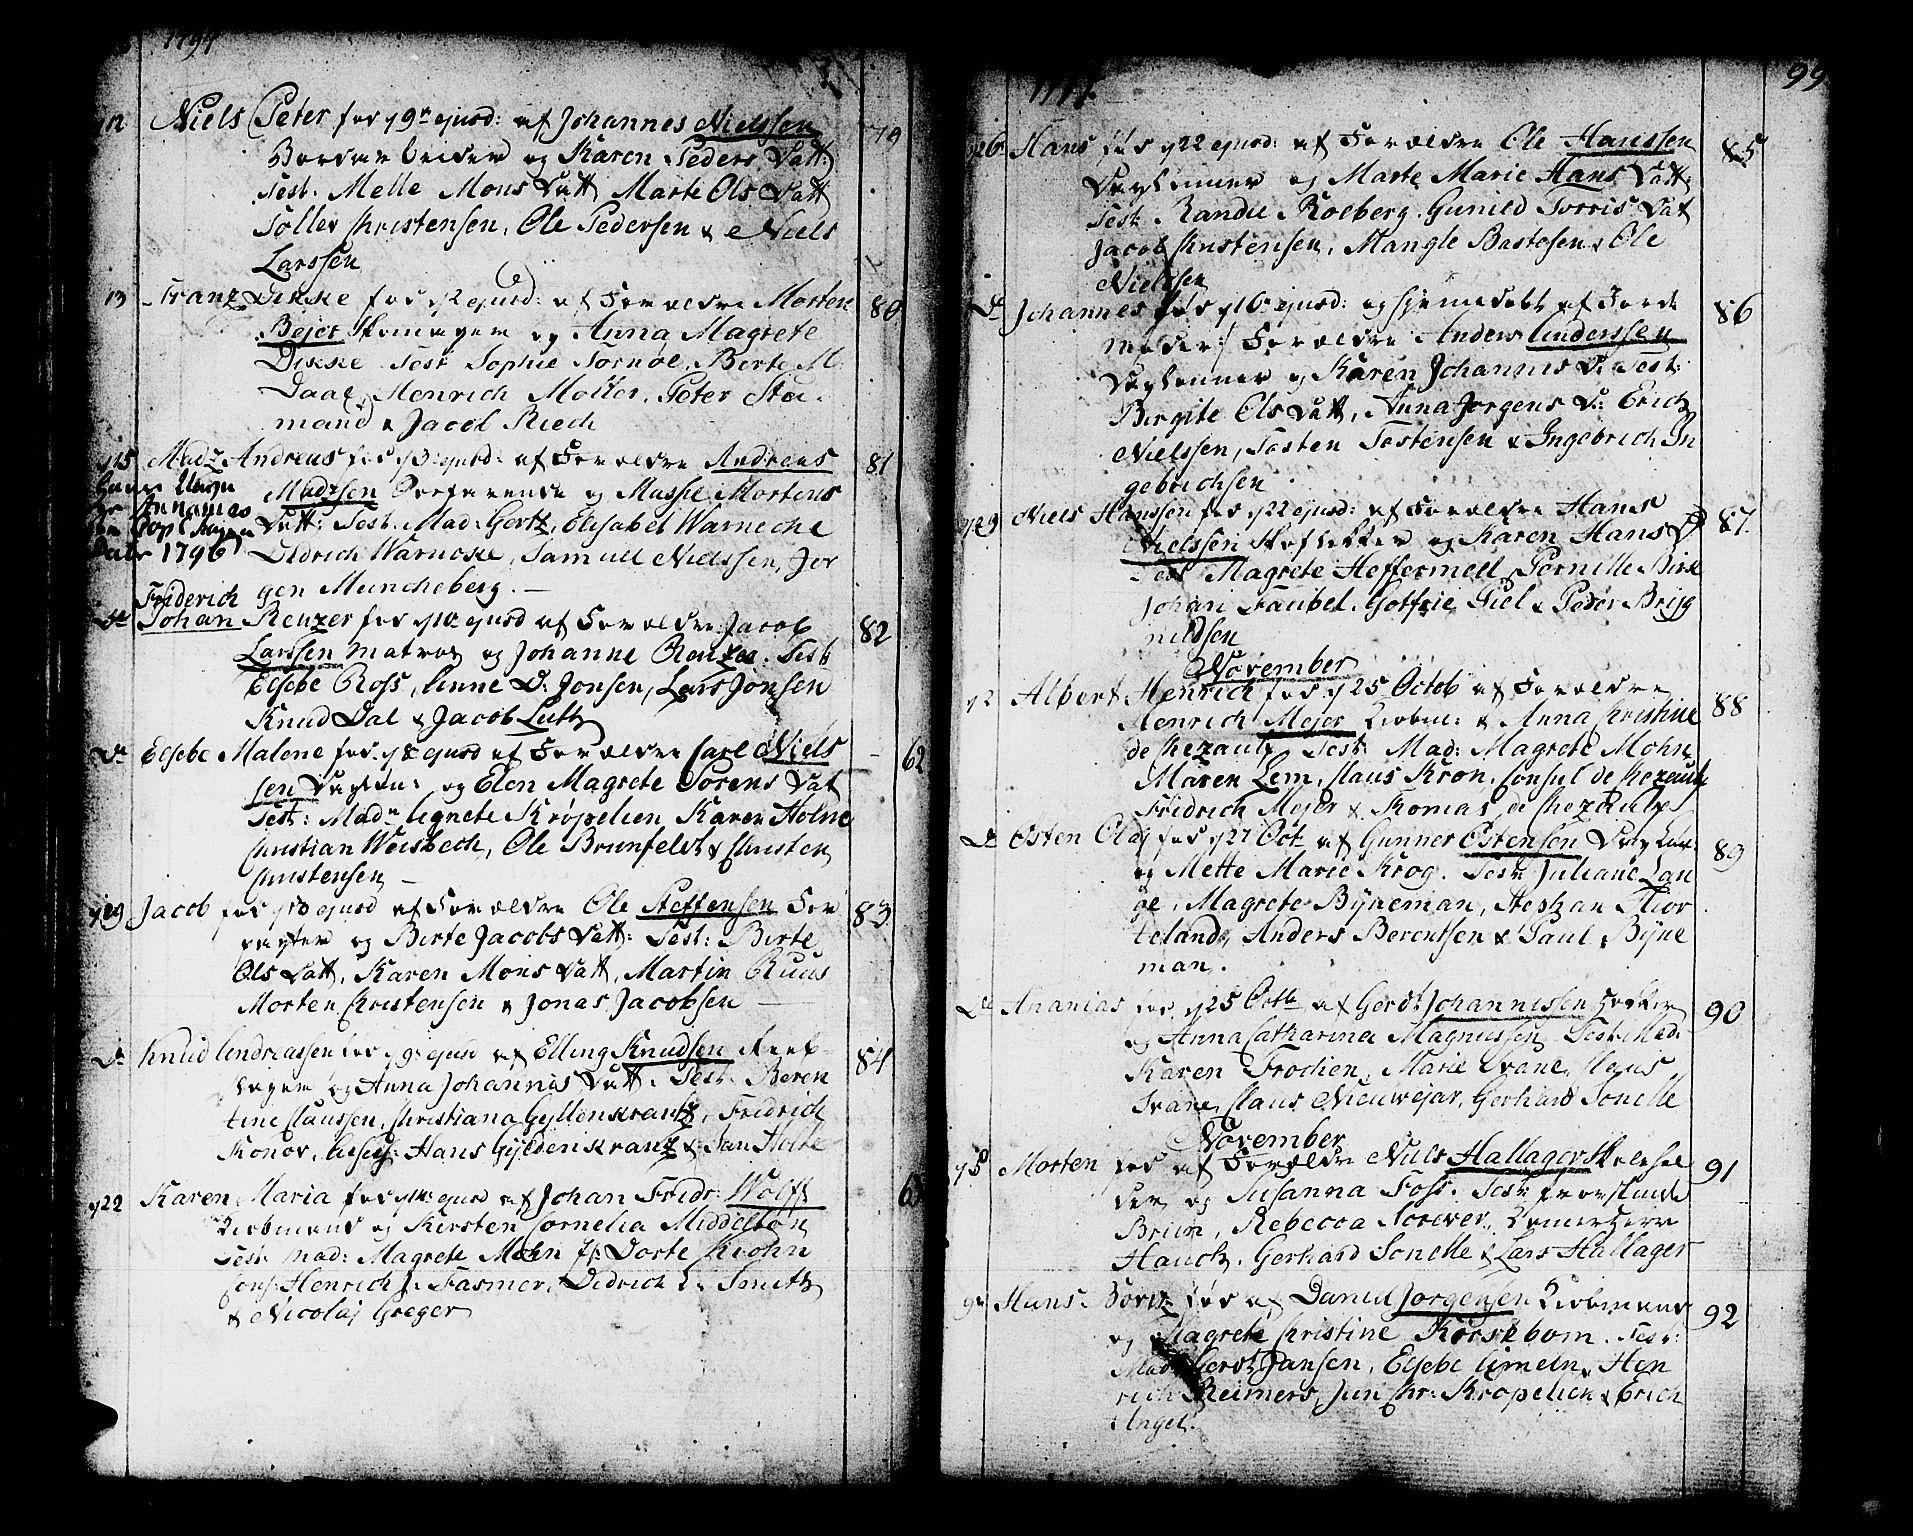 SAB, Domkirken Sokneprestembete, H/Haa/L0004: Ministerialbok nr. A 4, 1763-1820, s. 98-99